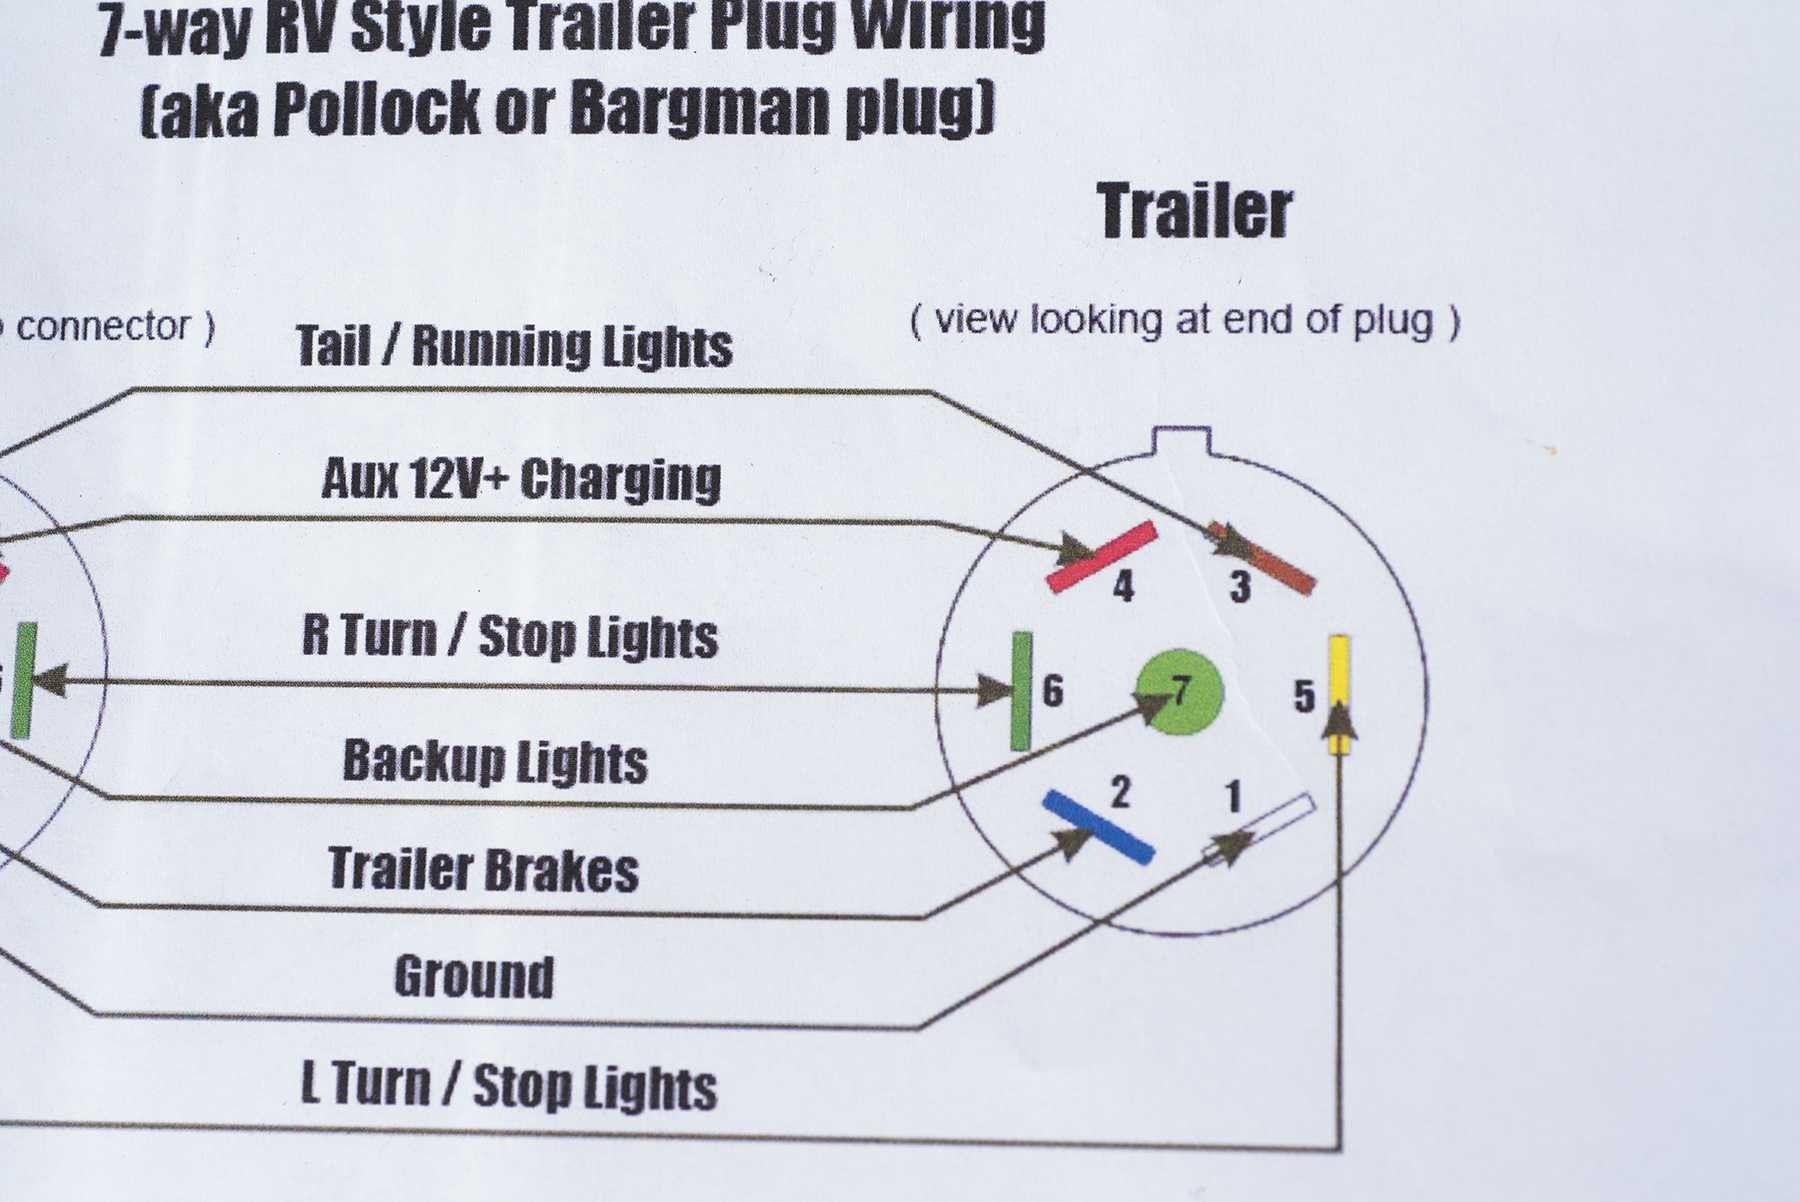 Trailer Plug Wiring Diagram Uk from i.pinimg.com